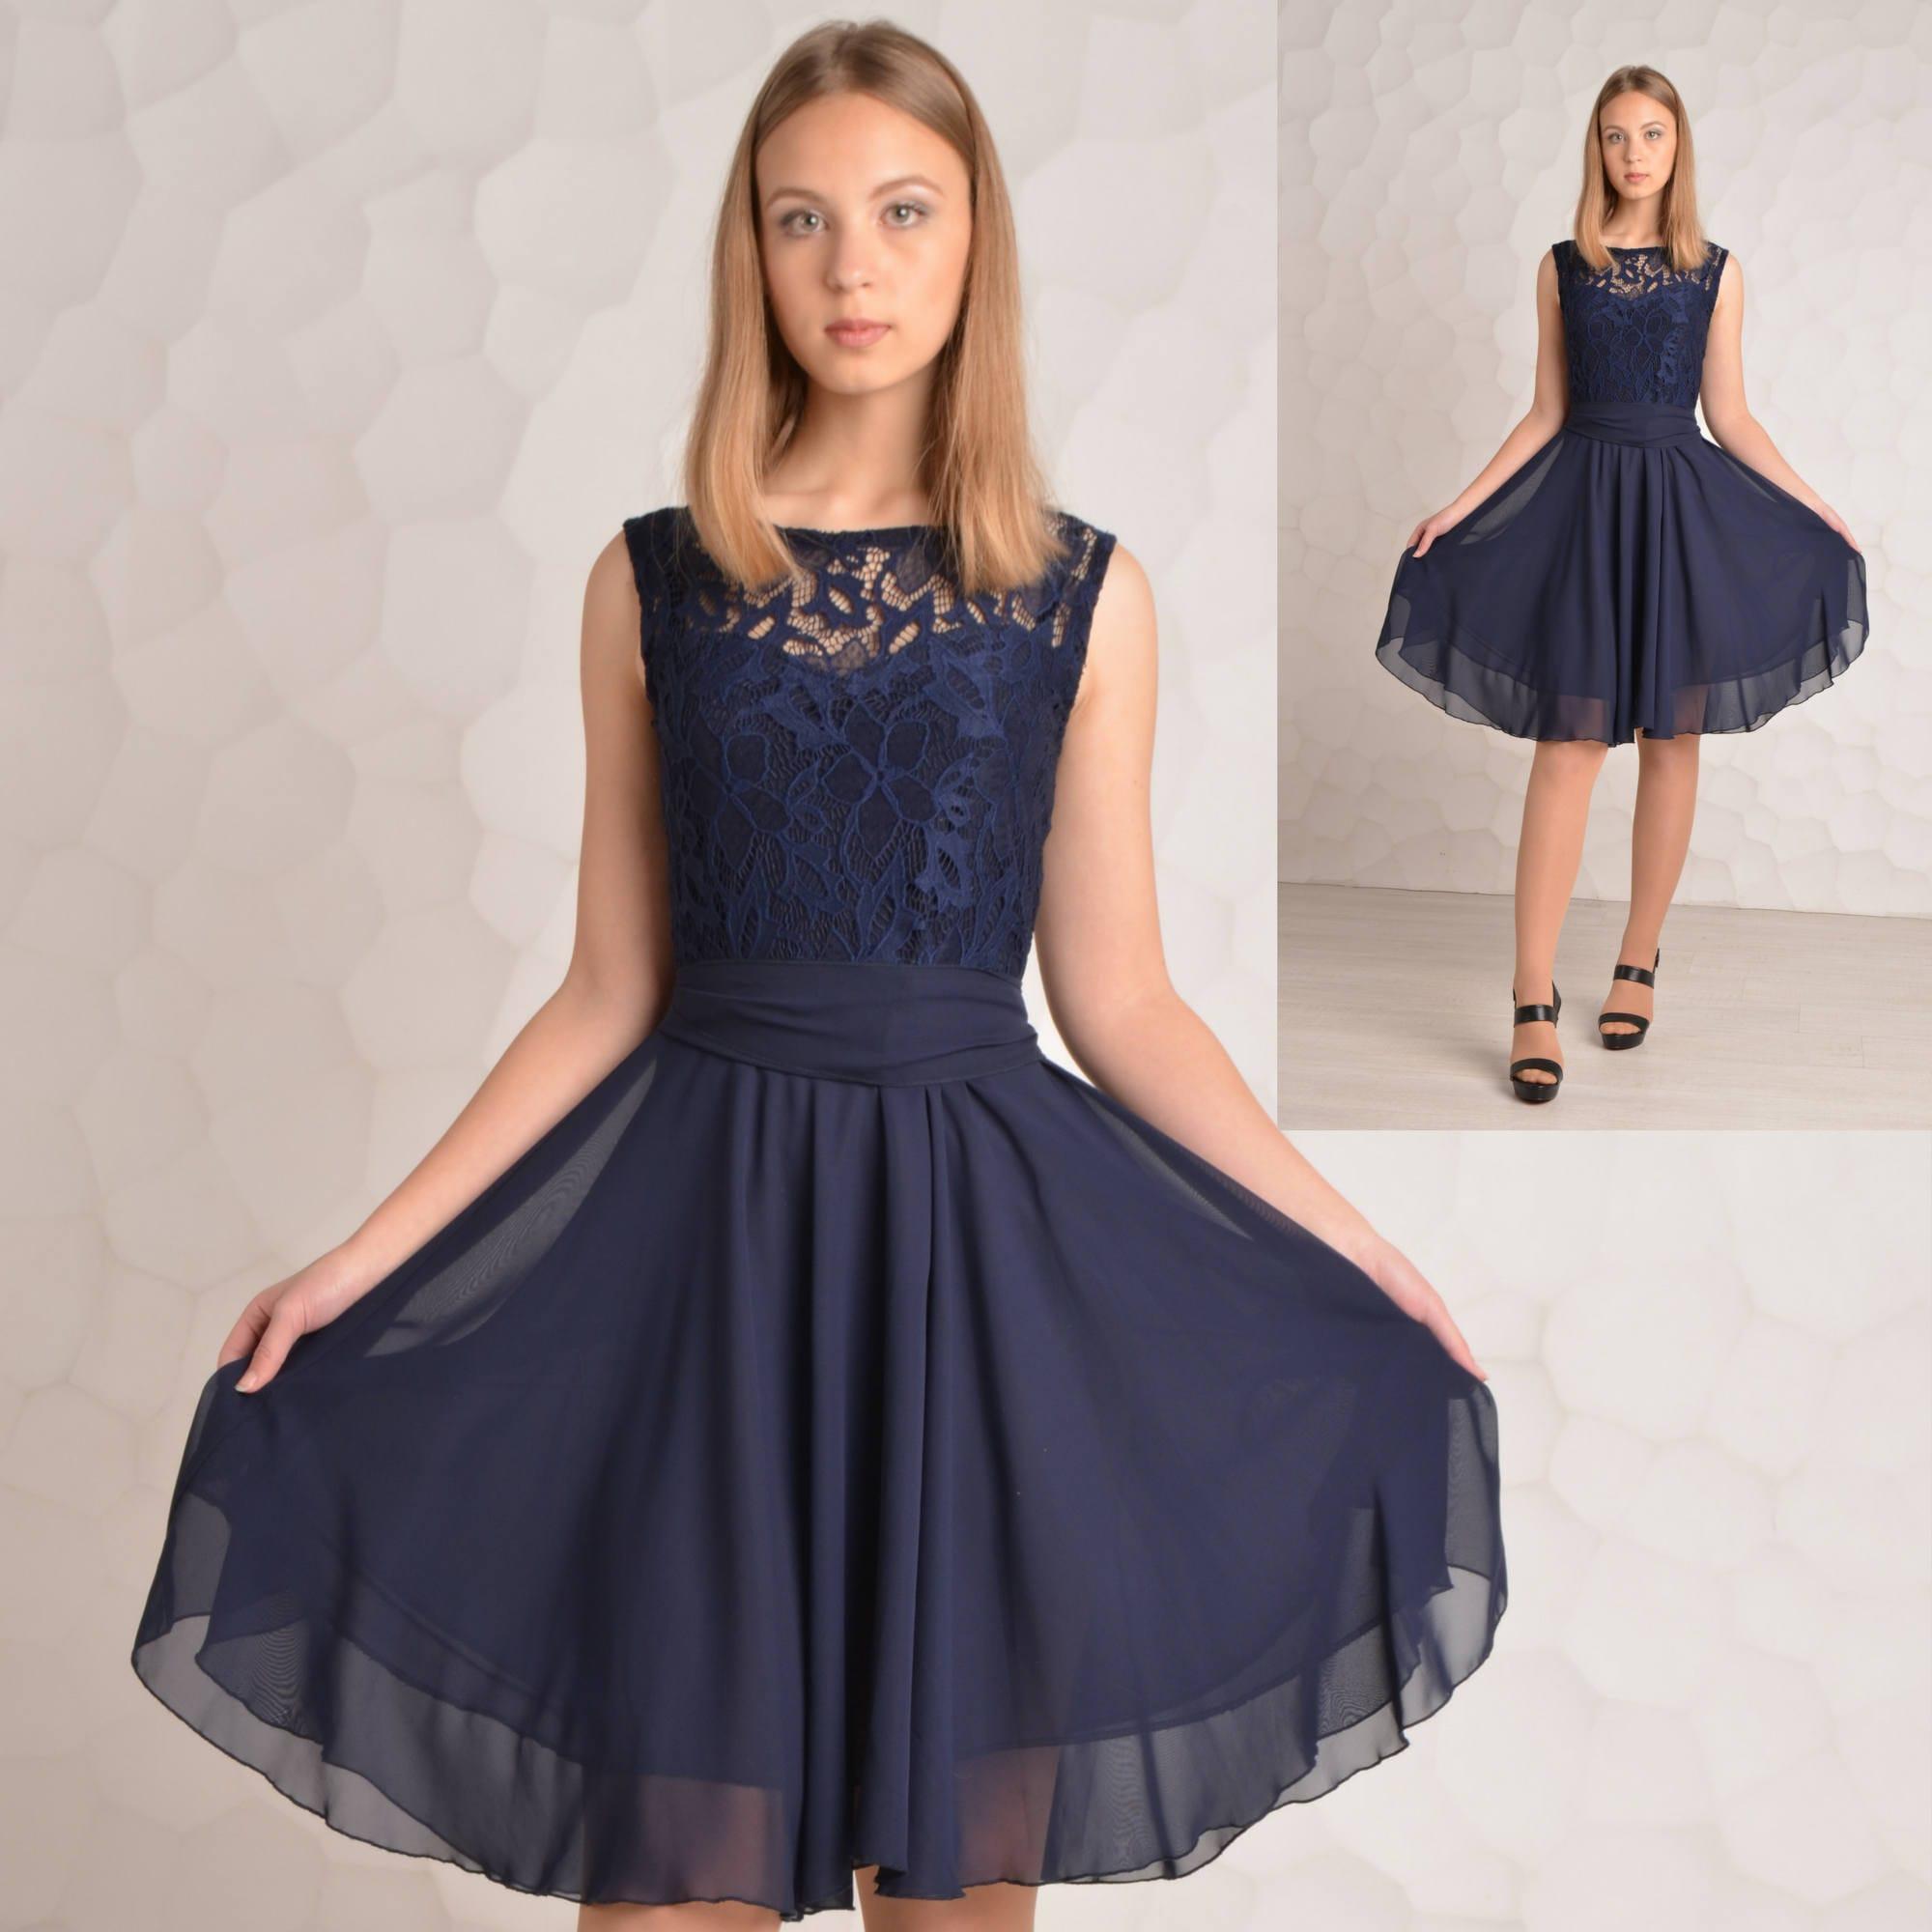 Bridesmaid dress navy blue cocktail dress bridesmaid dresses description blue short chiffon dress ombrellifo Gallery